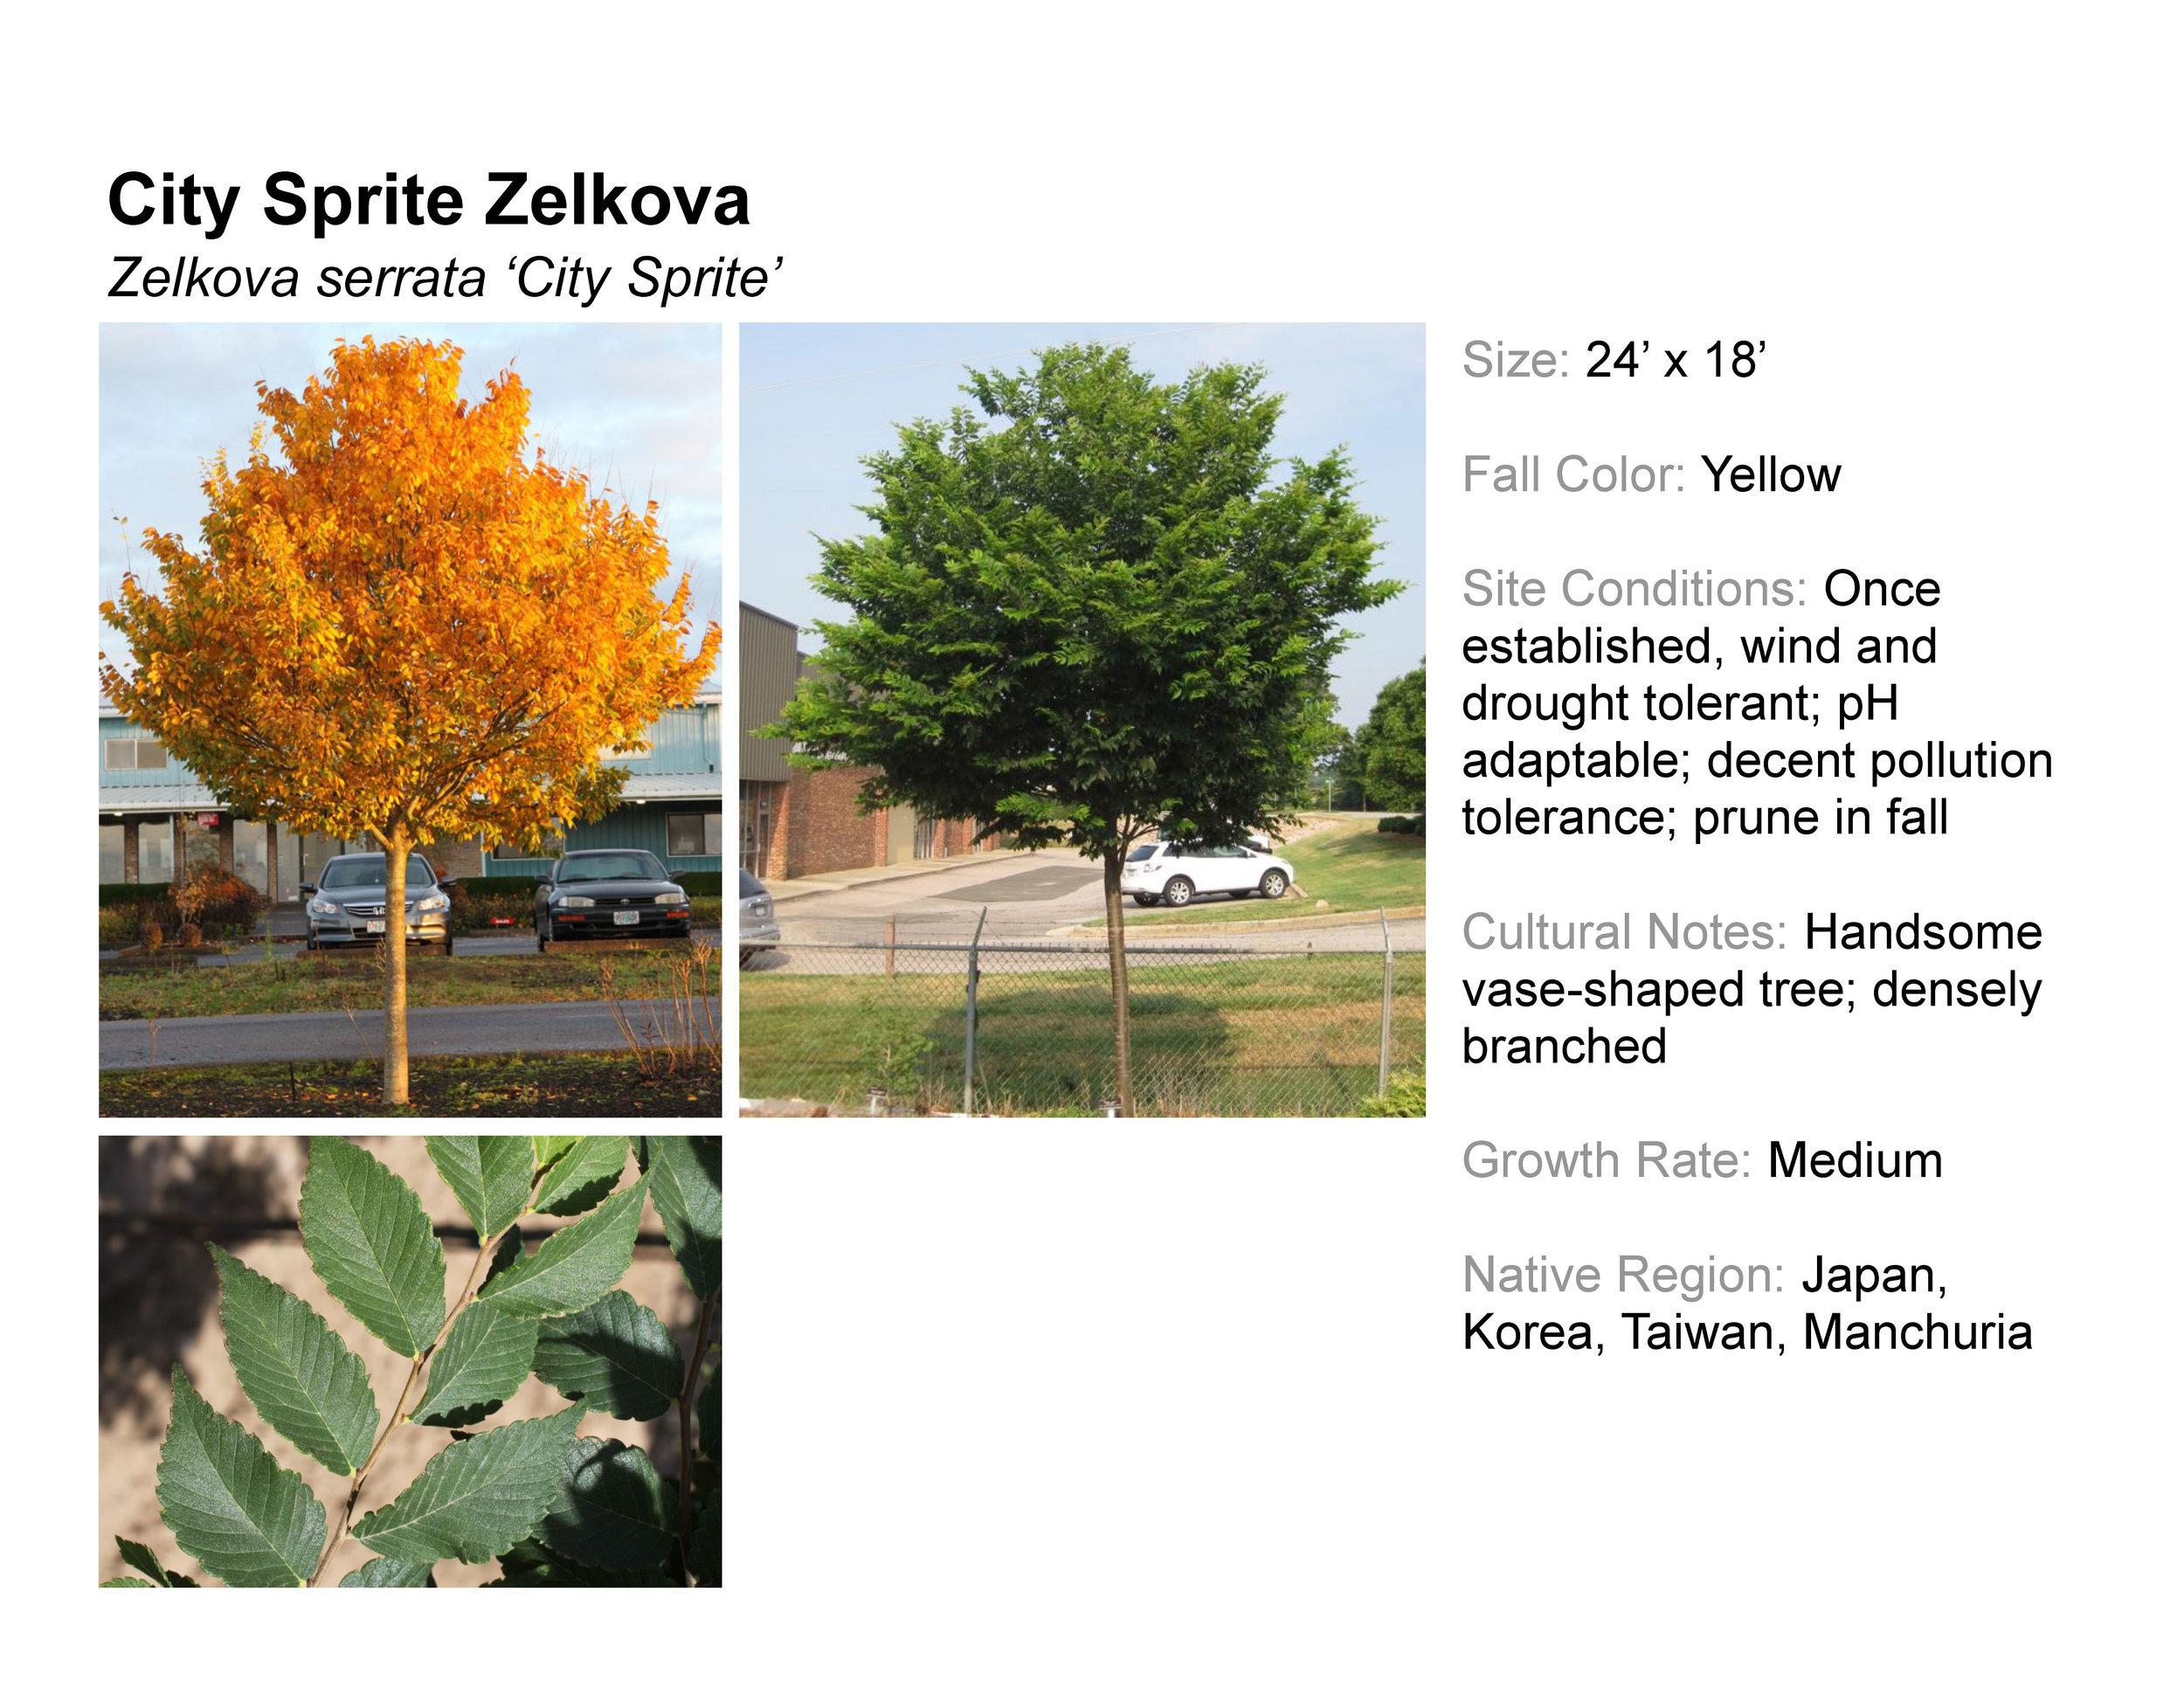 City Sprite Zelkova